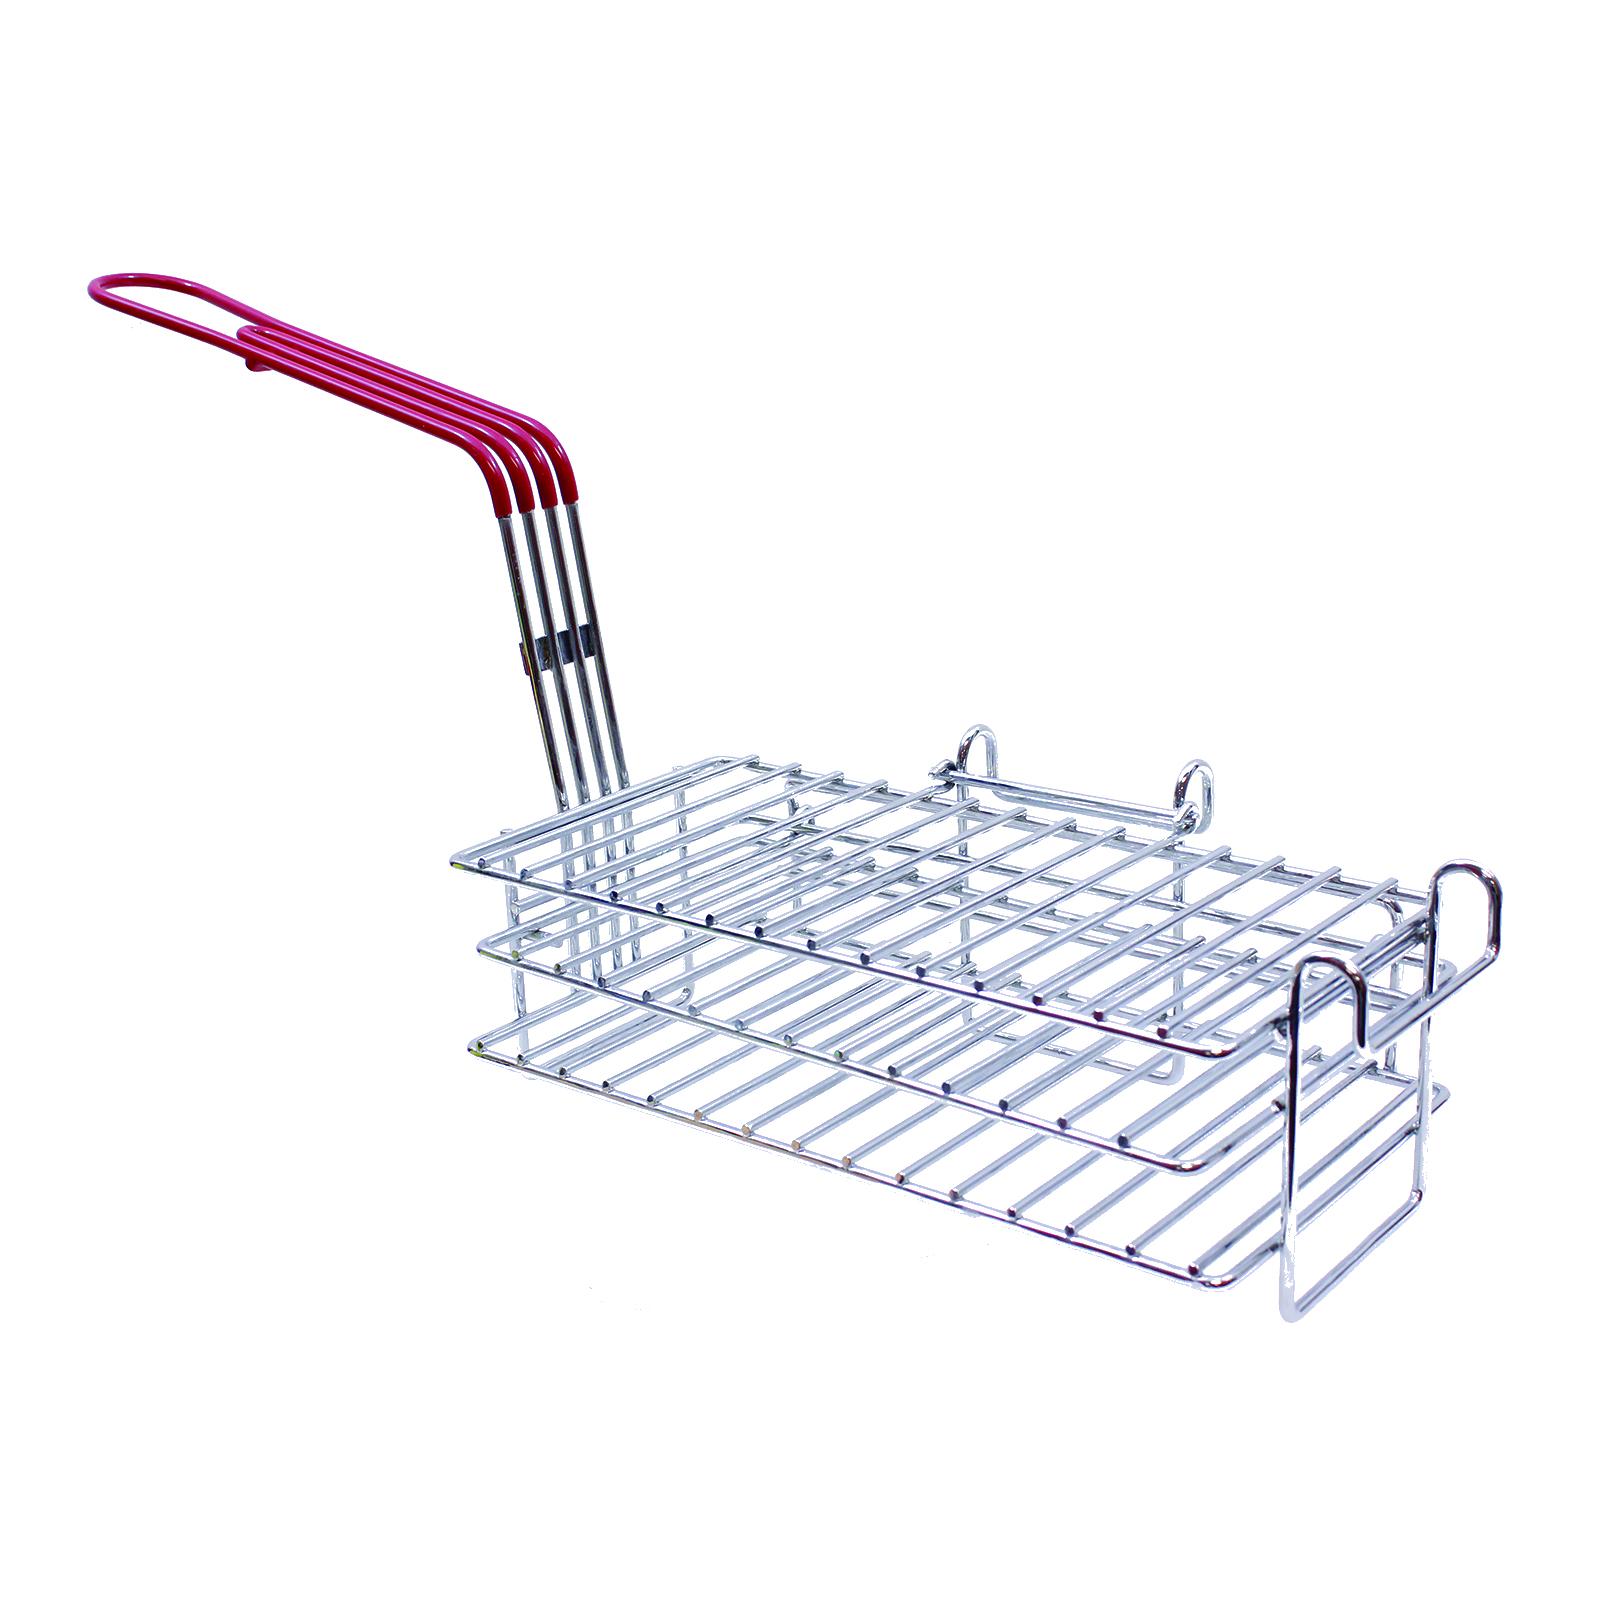 1600-31 TableCraft Products TB1164 fryer basket